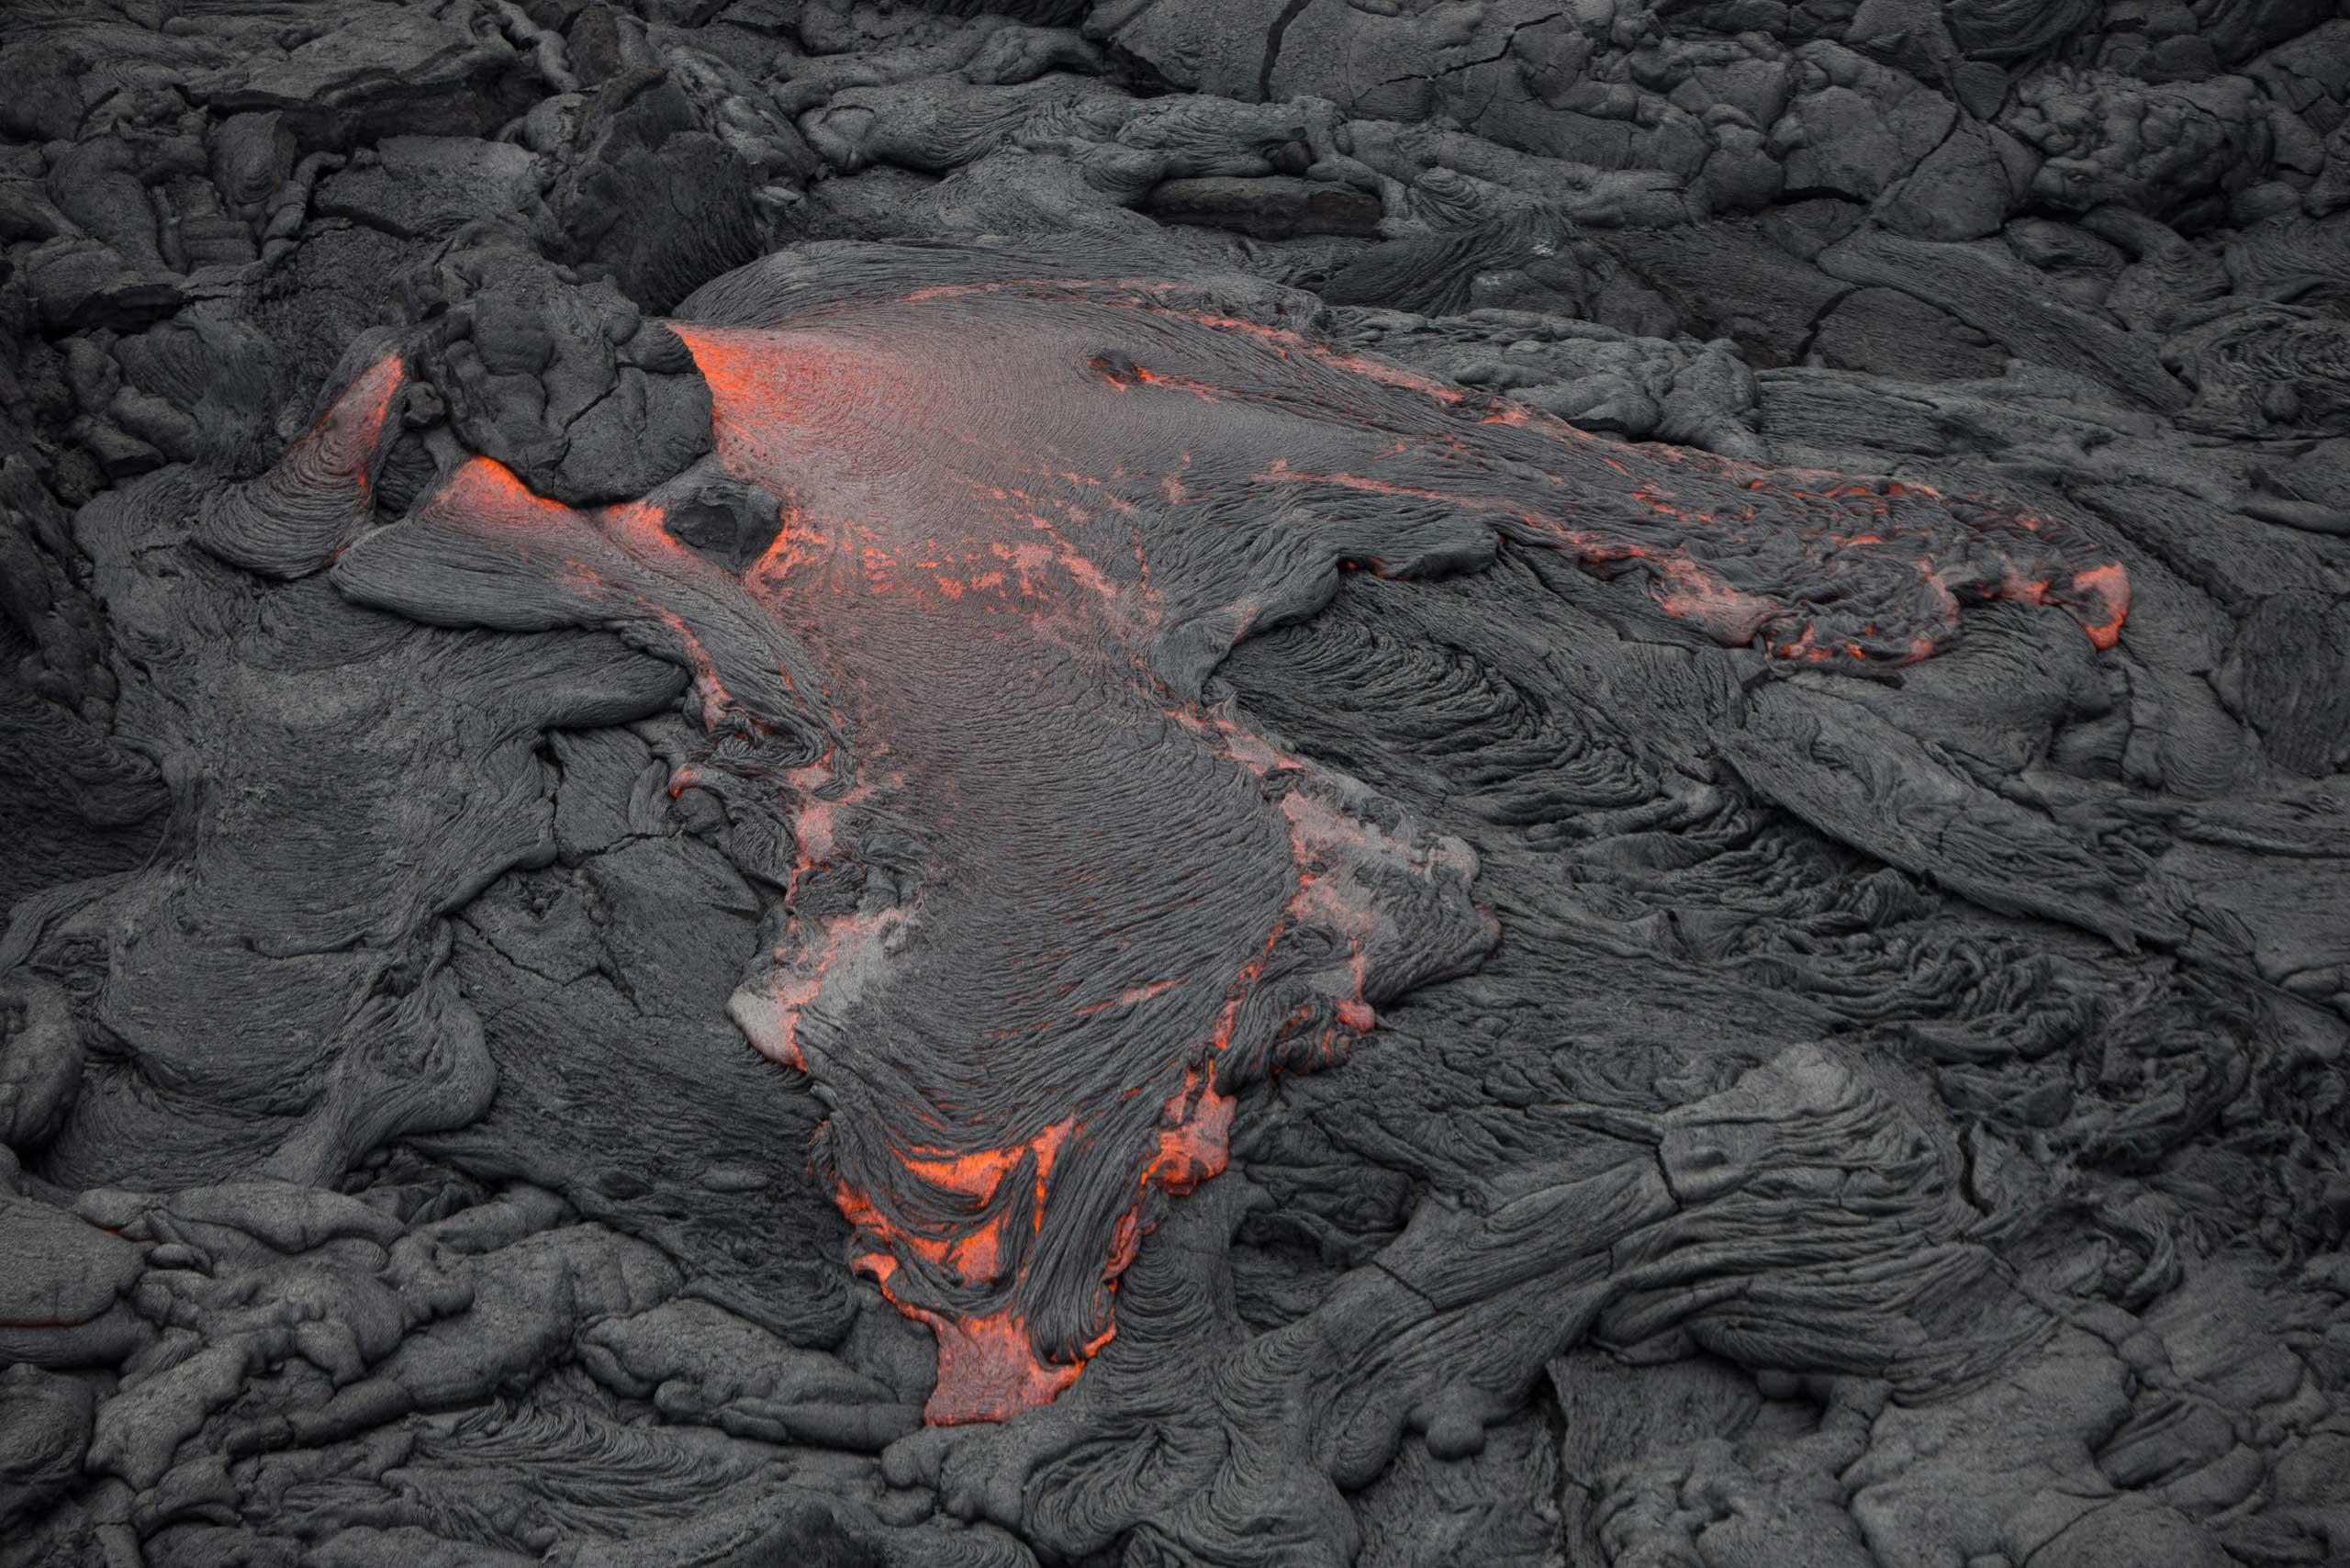 Oct. 29, 2014. Lava from Kilauea Volcano runs on the island of Hawaii, threatening the town of Pahoa.